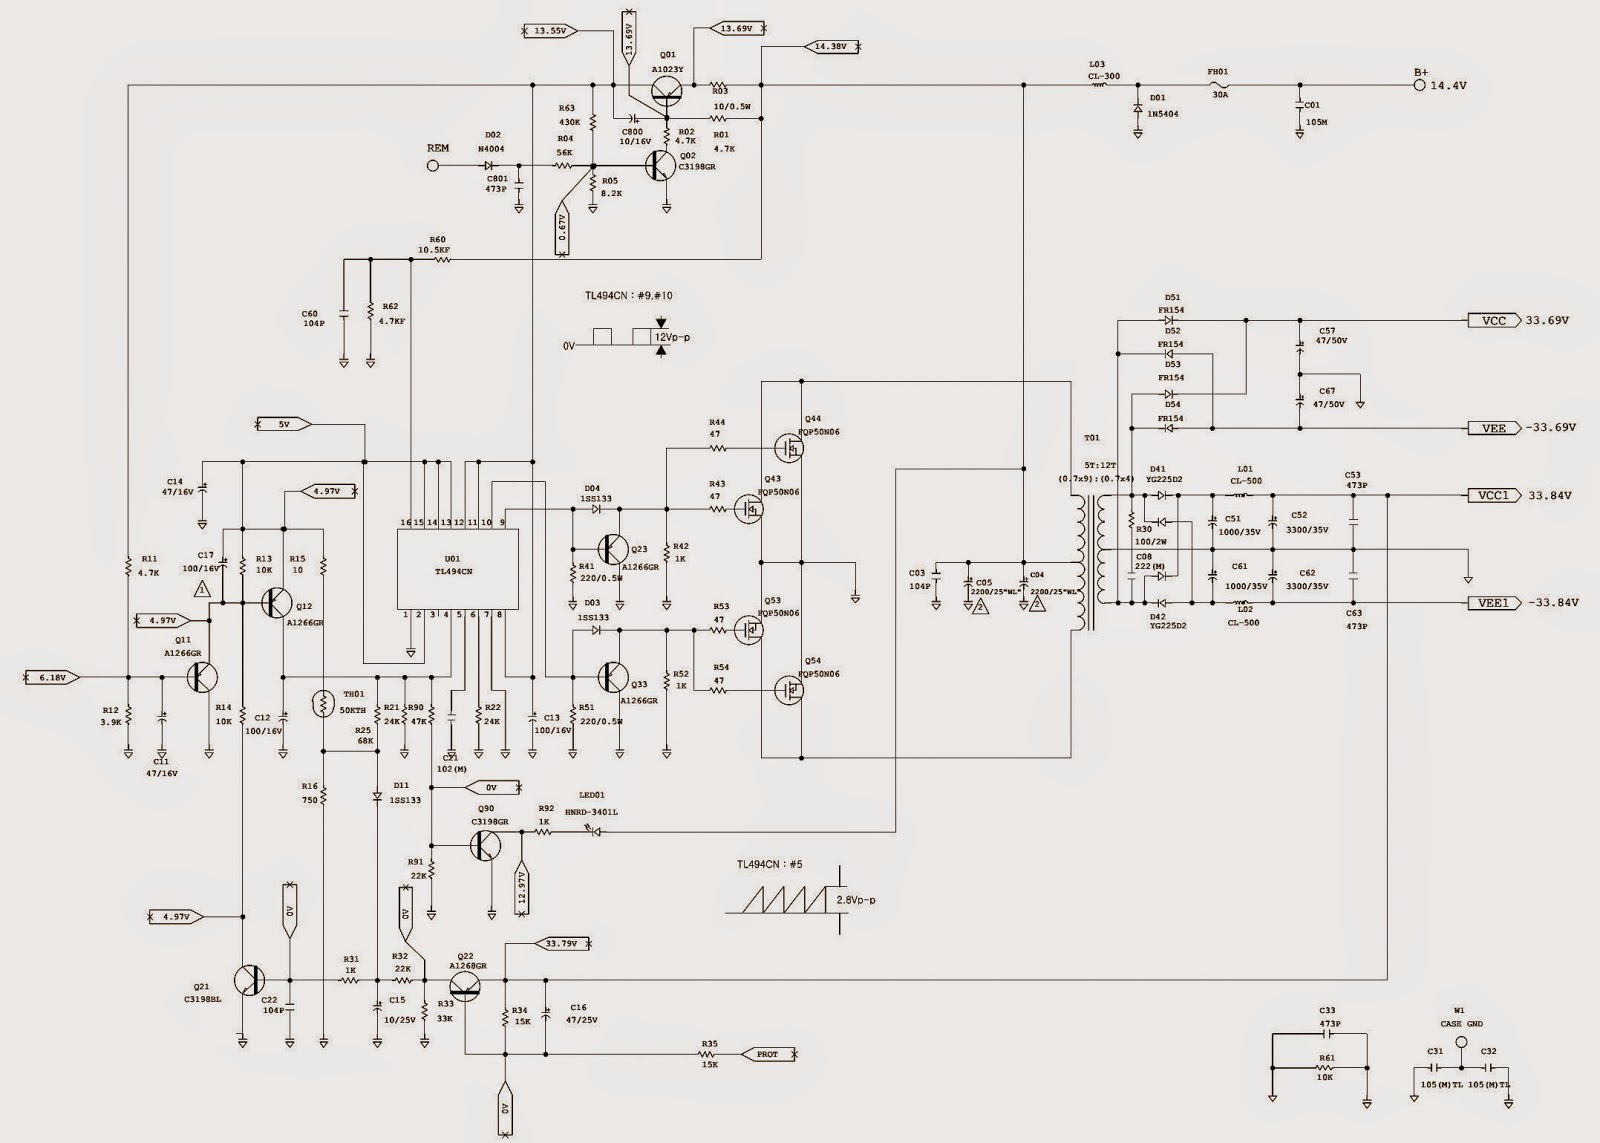 jbl car audio gto 75 2 wiring diagram installation 2006 gto wiring diagram 2006 gto [ 1600 x 1143 Pixel ]